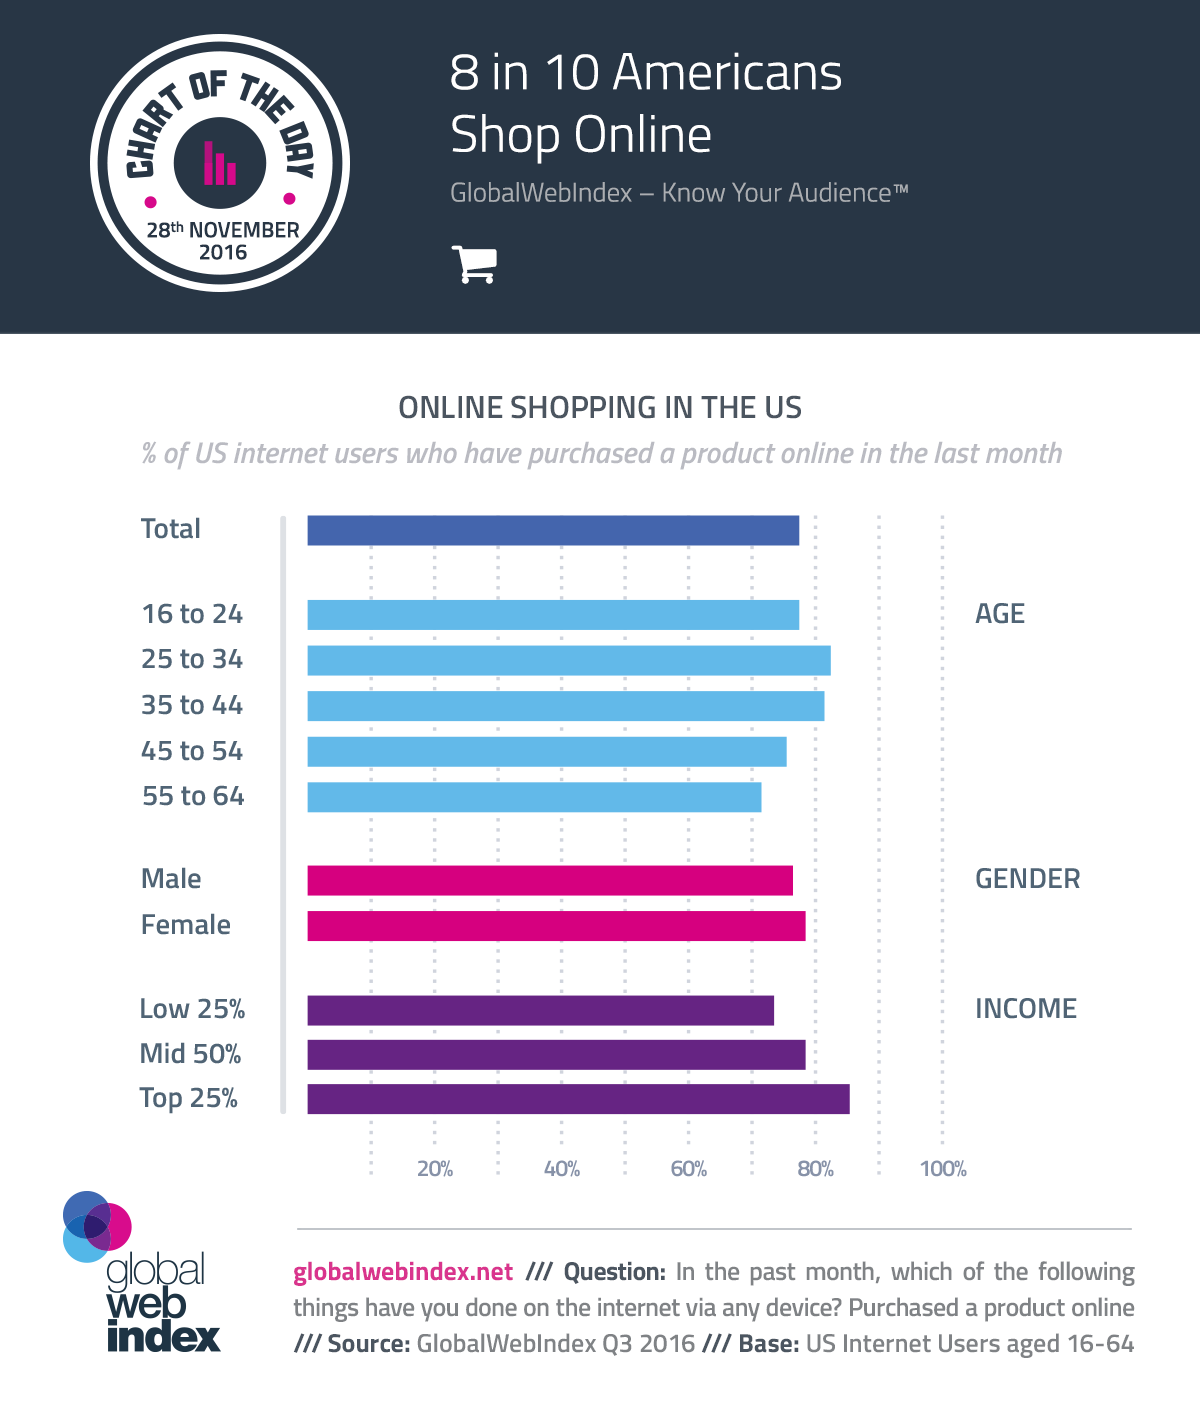 8 in 10 Americans Shop Online